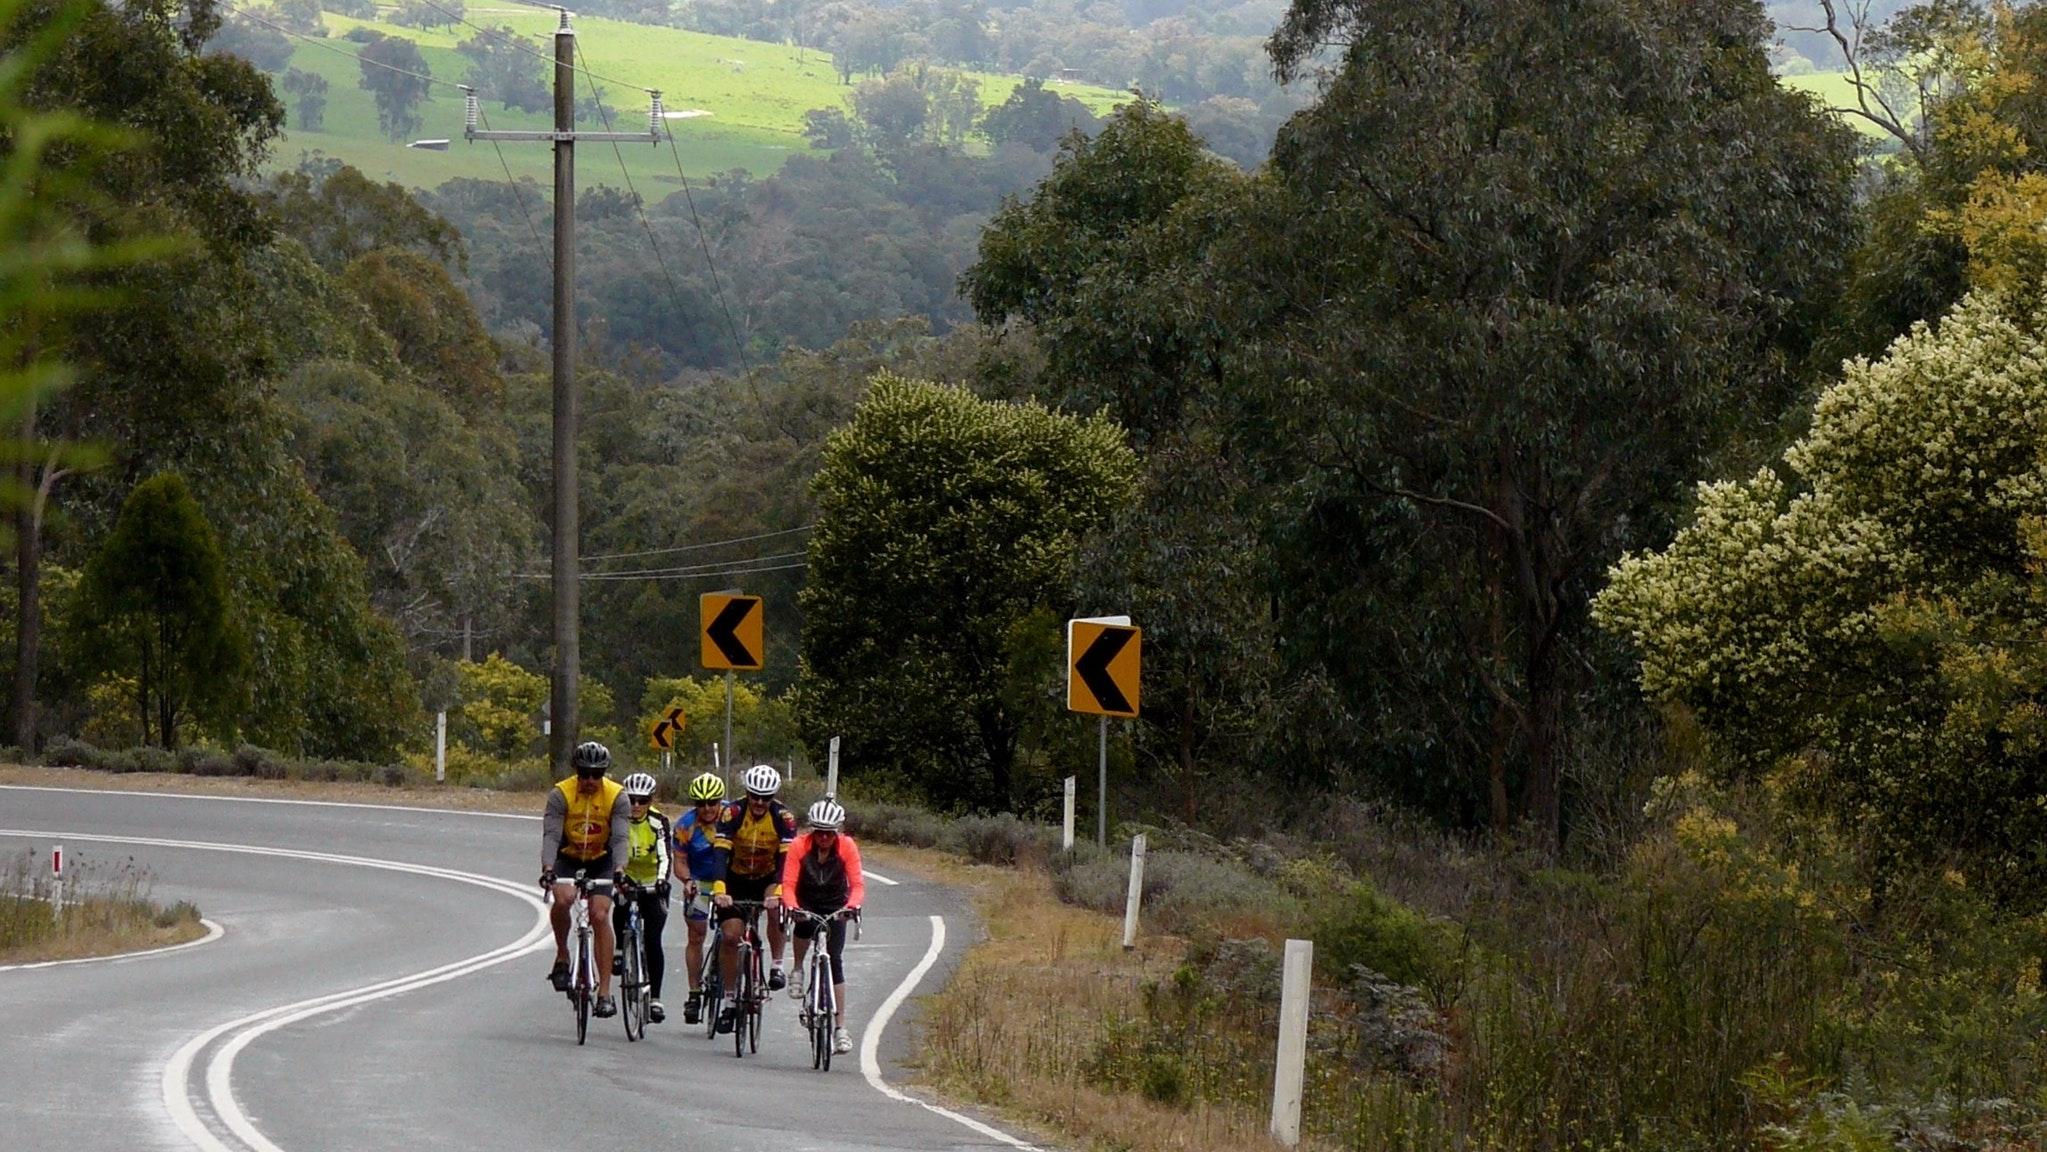 Cycling towards Mitta Mitta